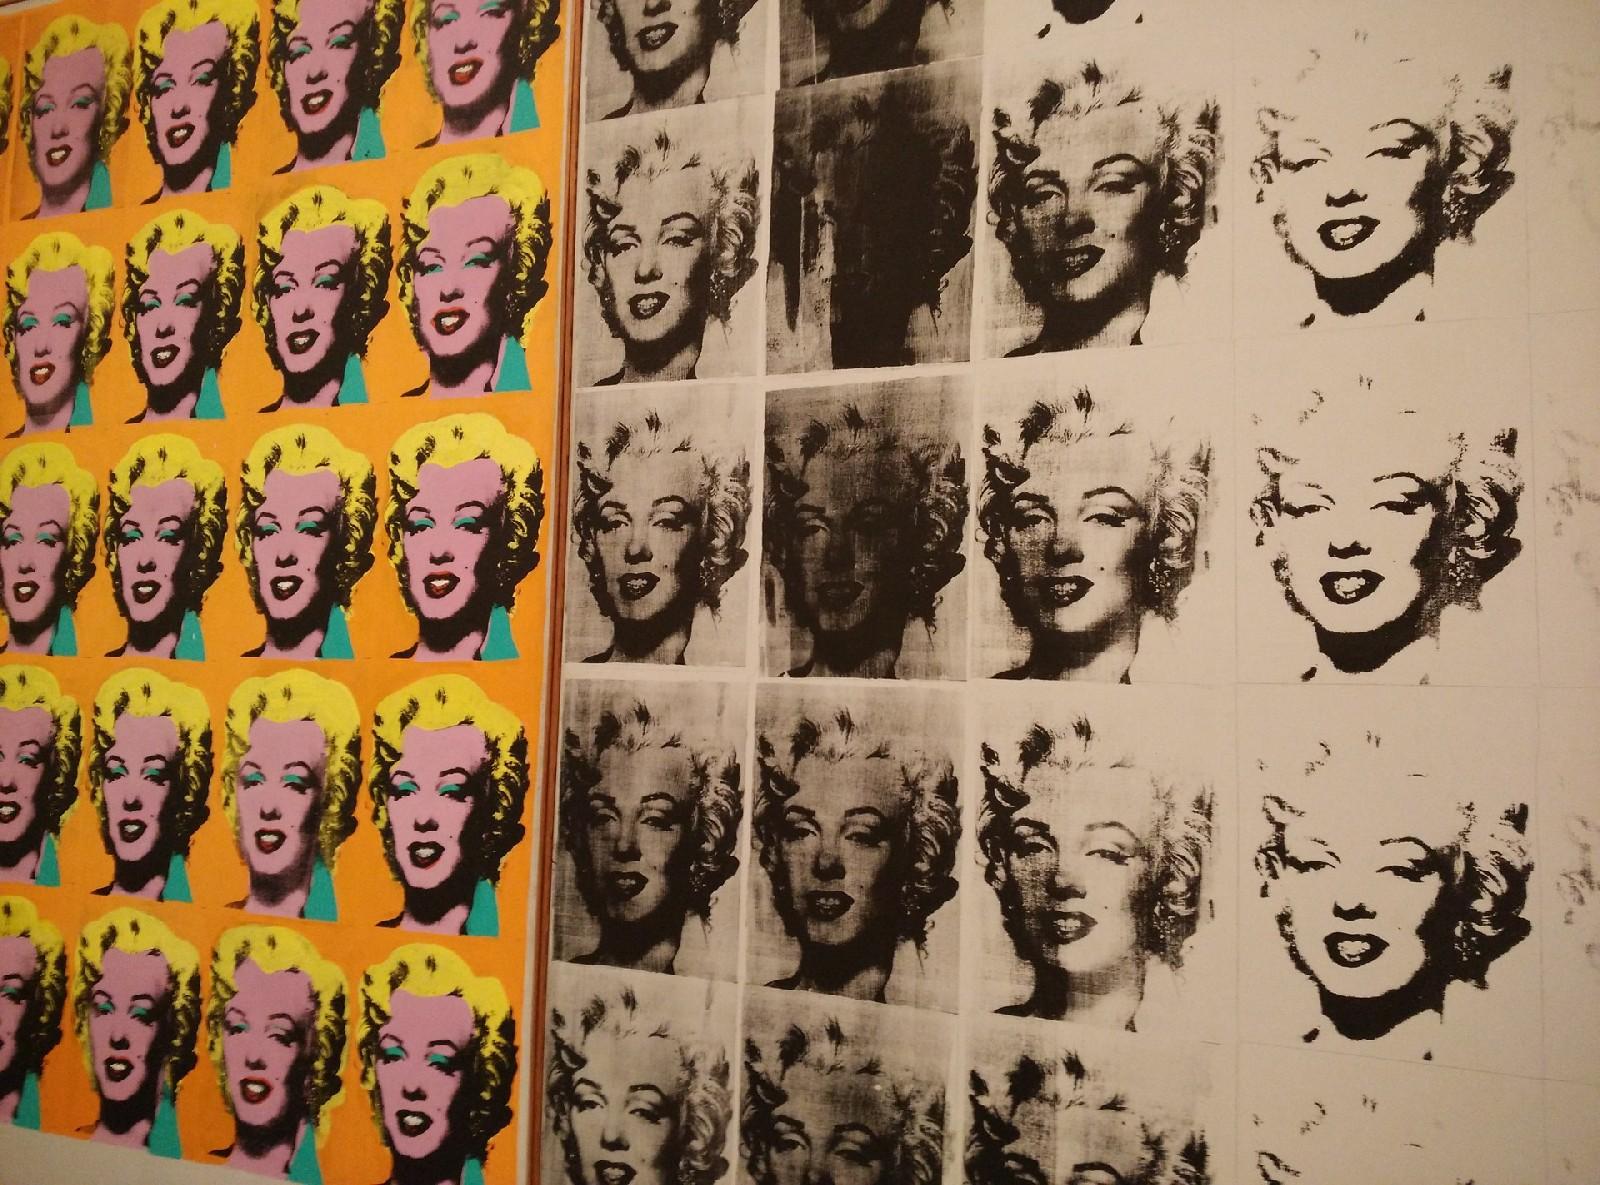 Andy Warhol. Marilyn Monroe.